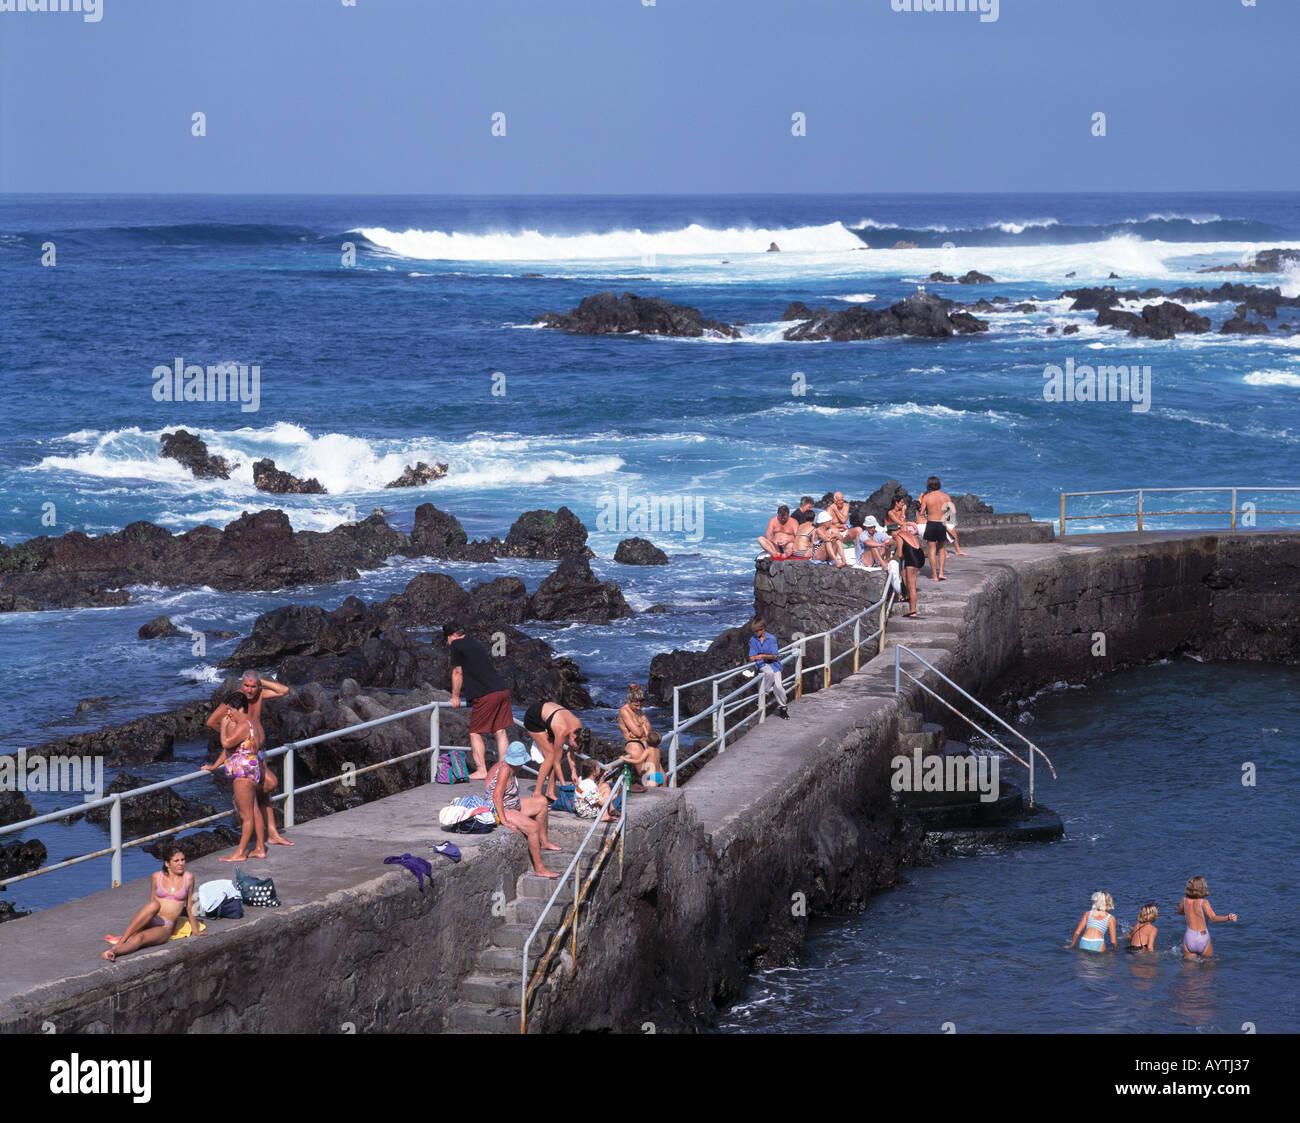 Meeresschwimmbaeder, Touristen baden im Meer, Brandung ...